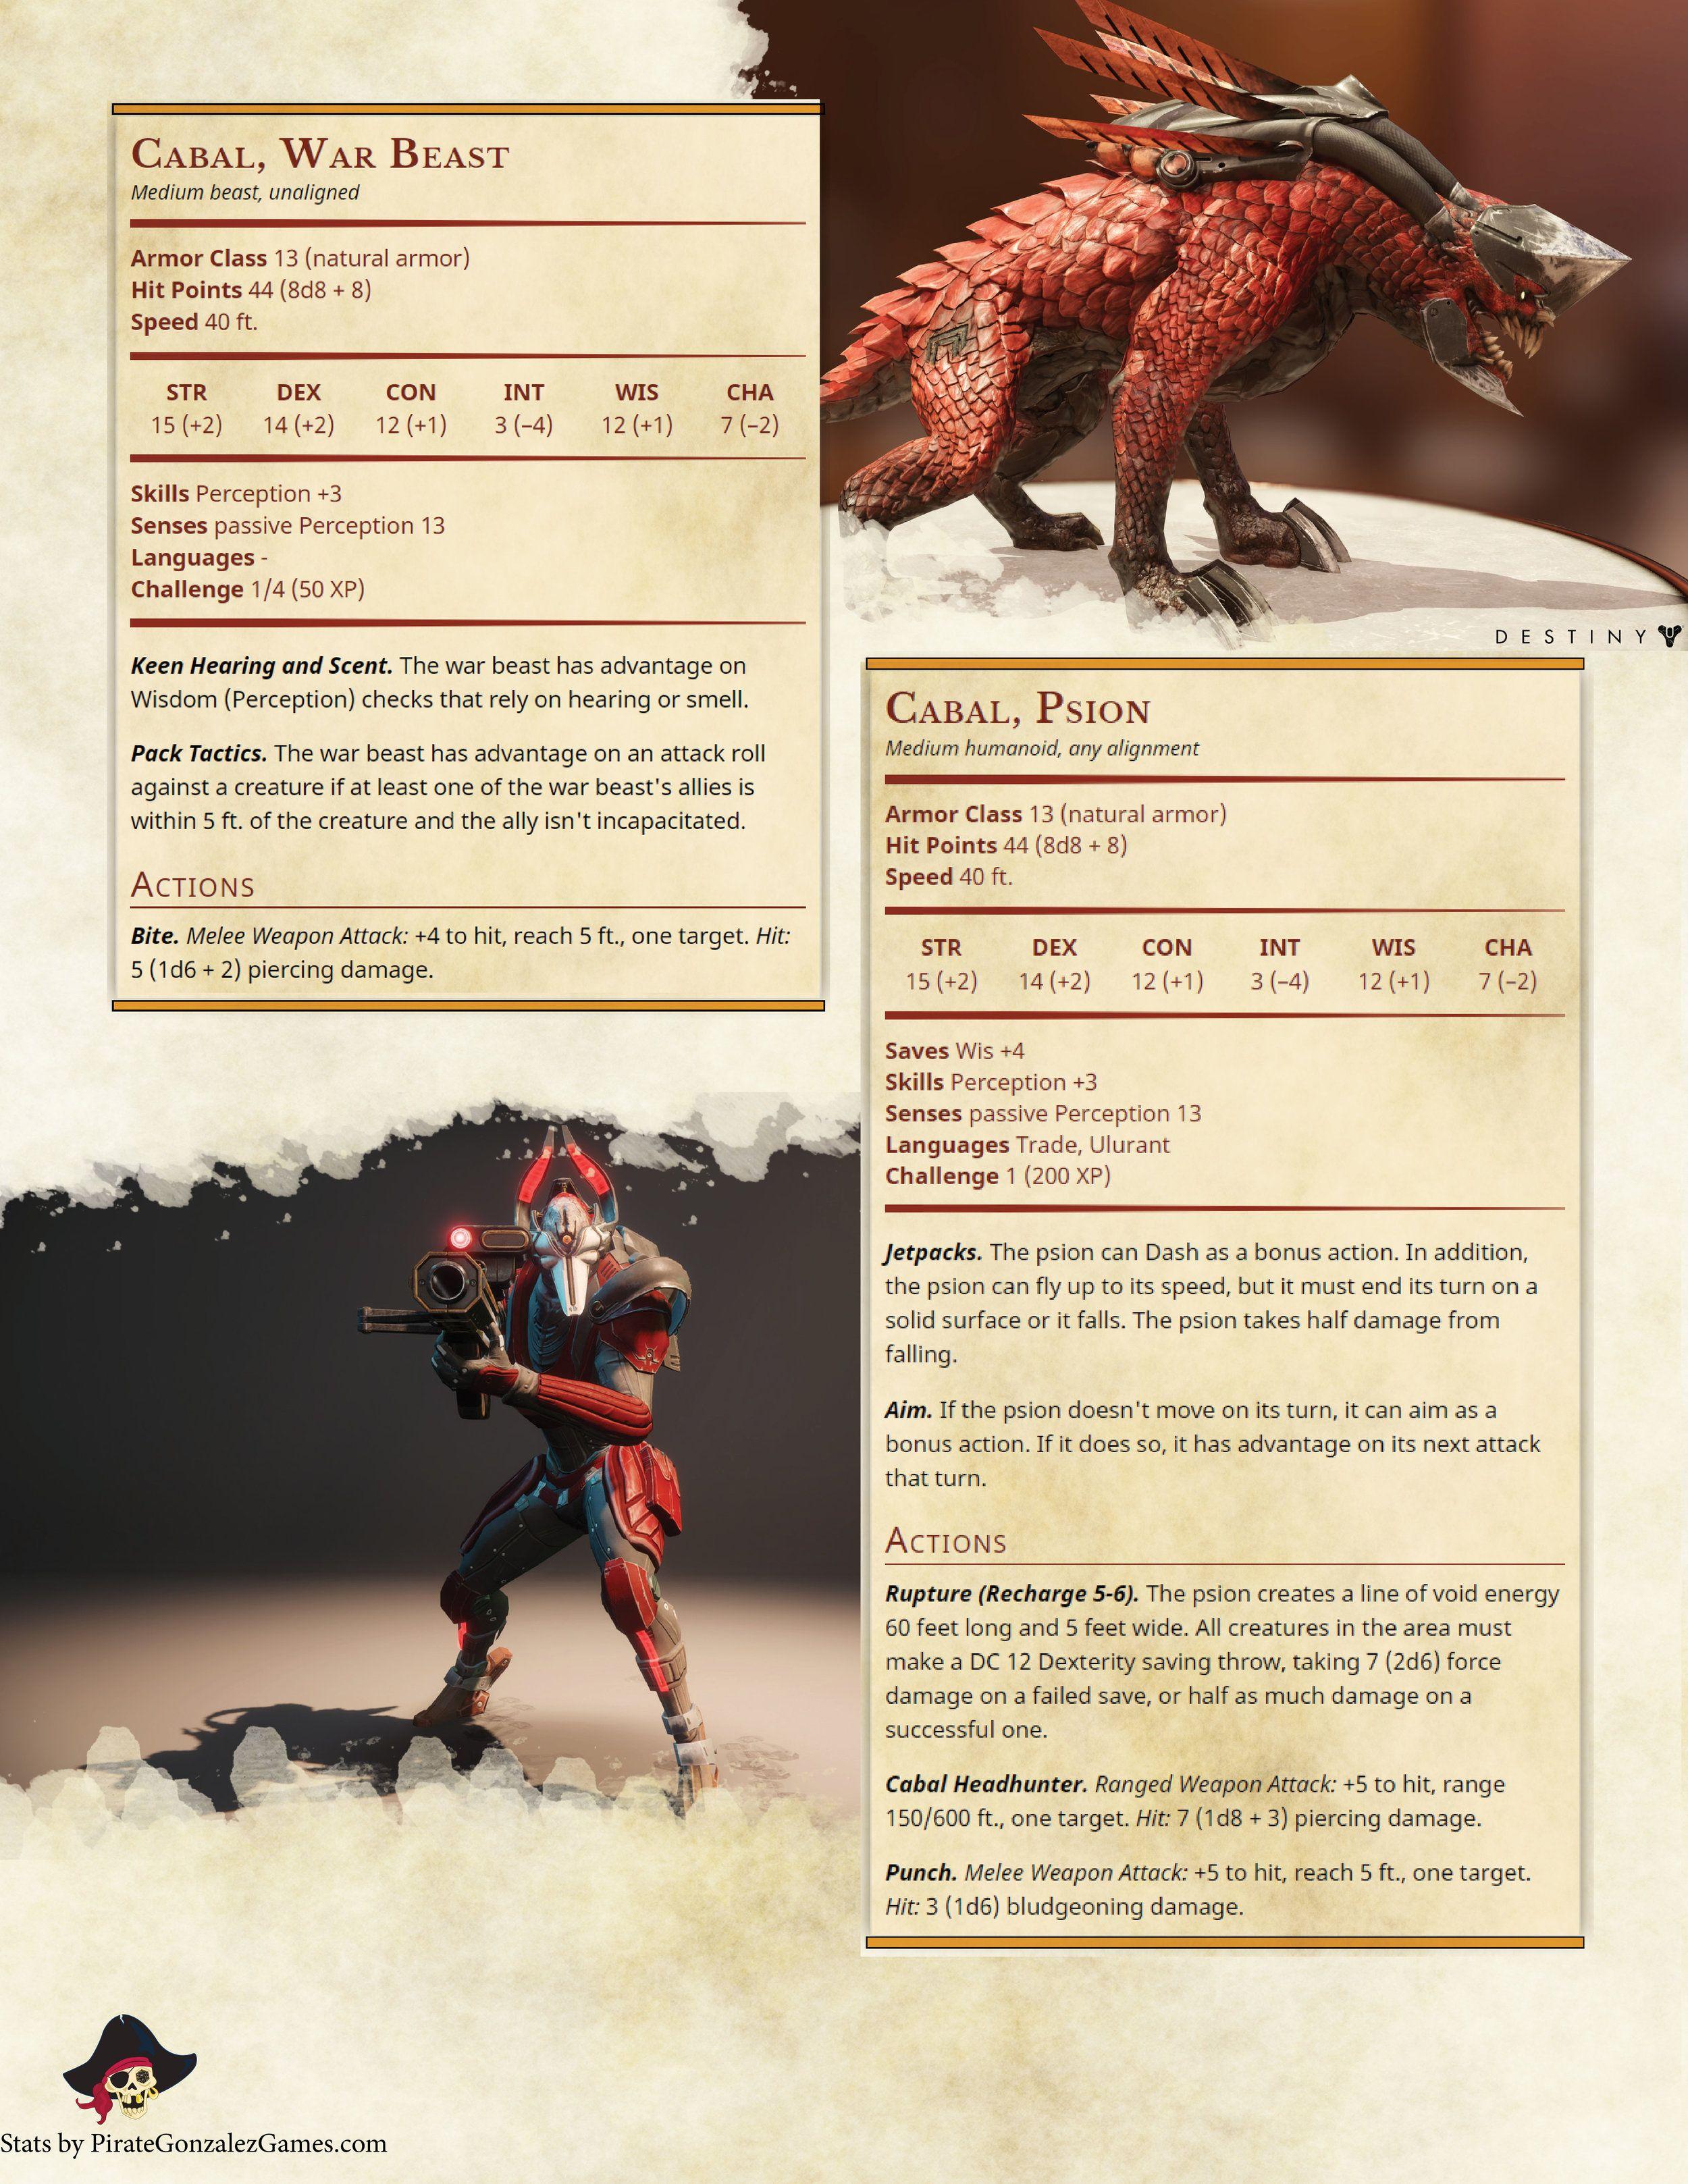 Cabal War Beast, Cabal Psion | D&D Stuff in 2019 | Dungeons, dragons